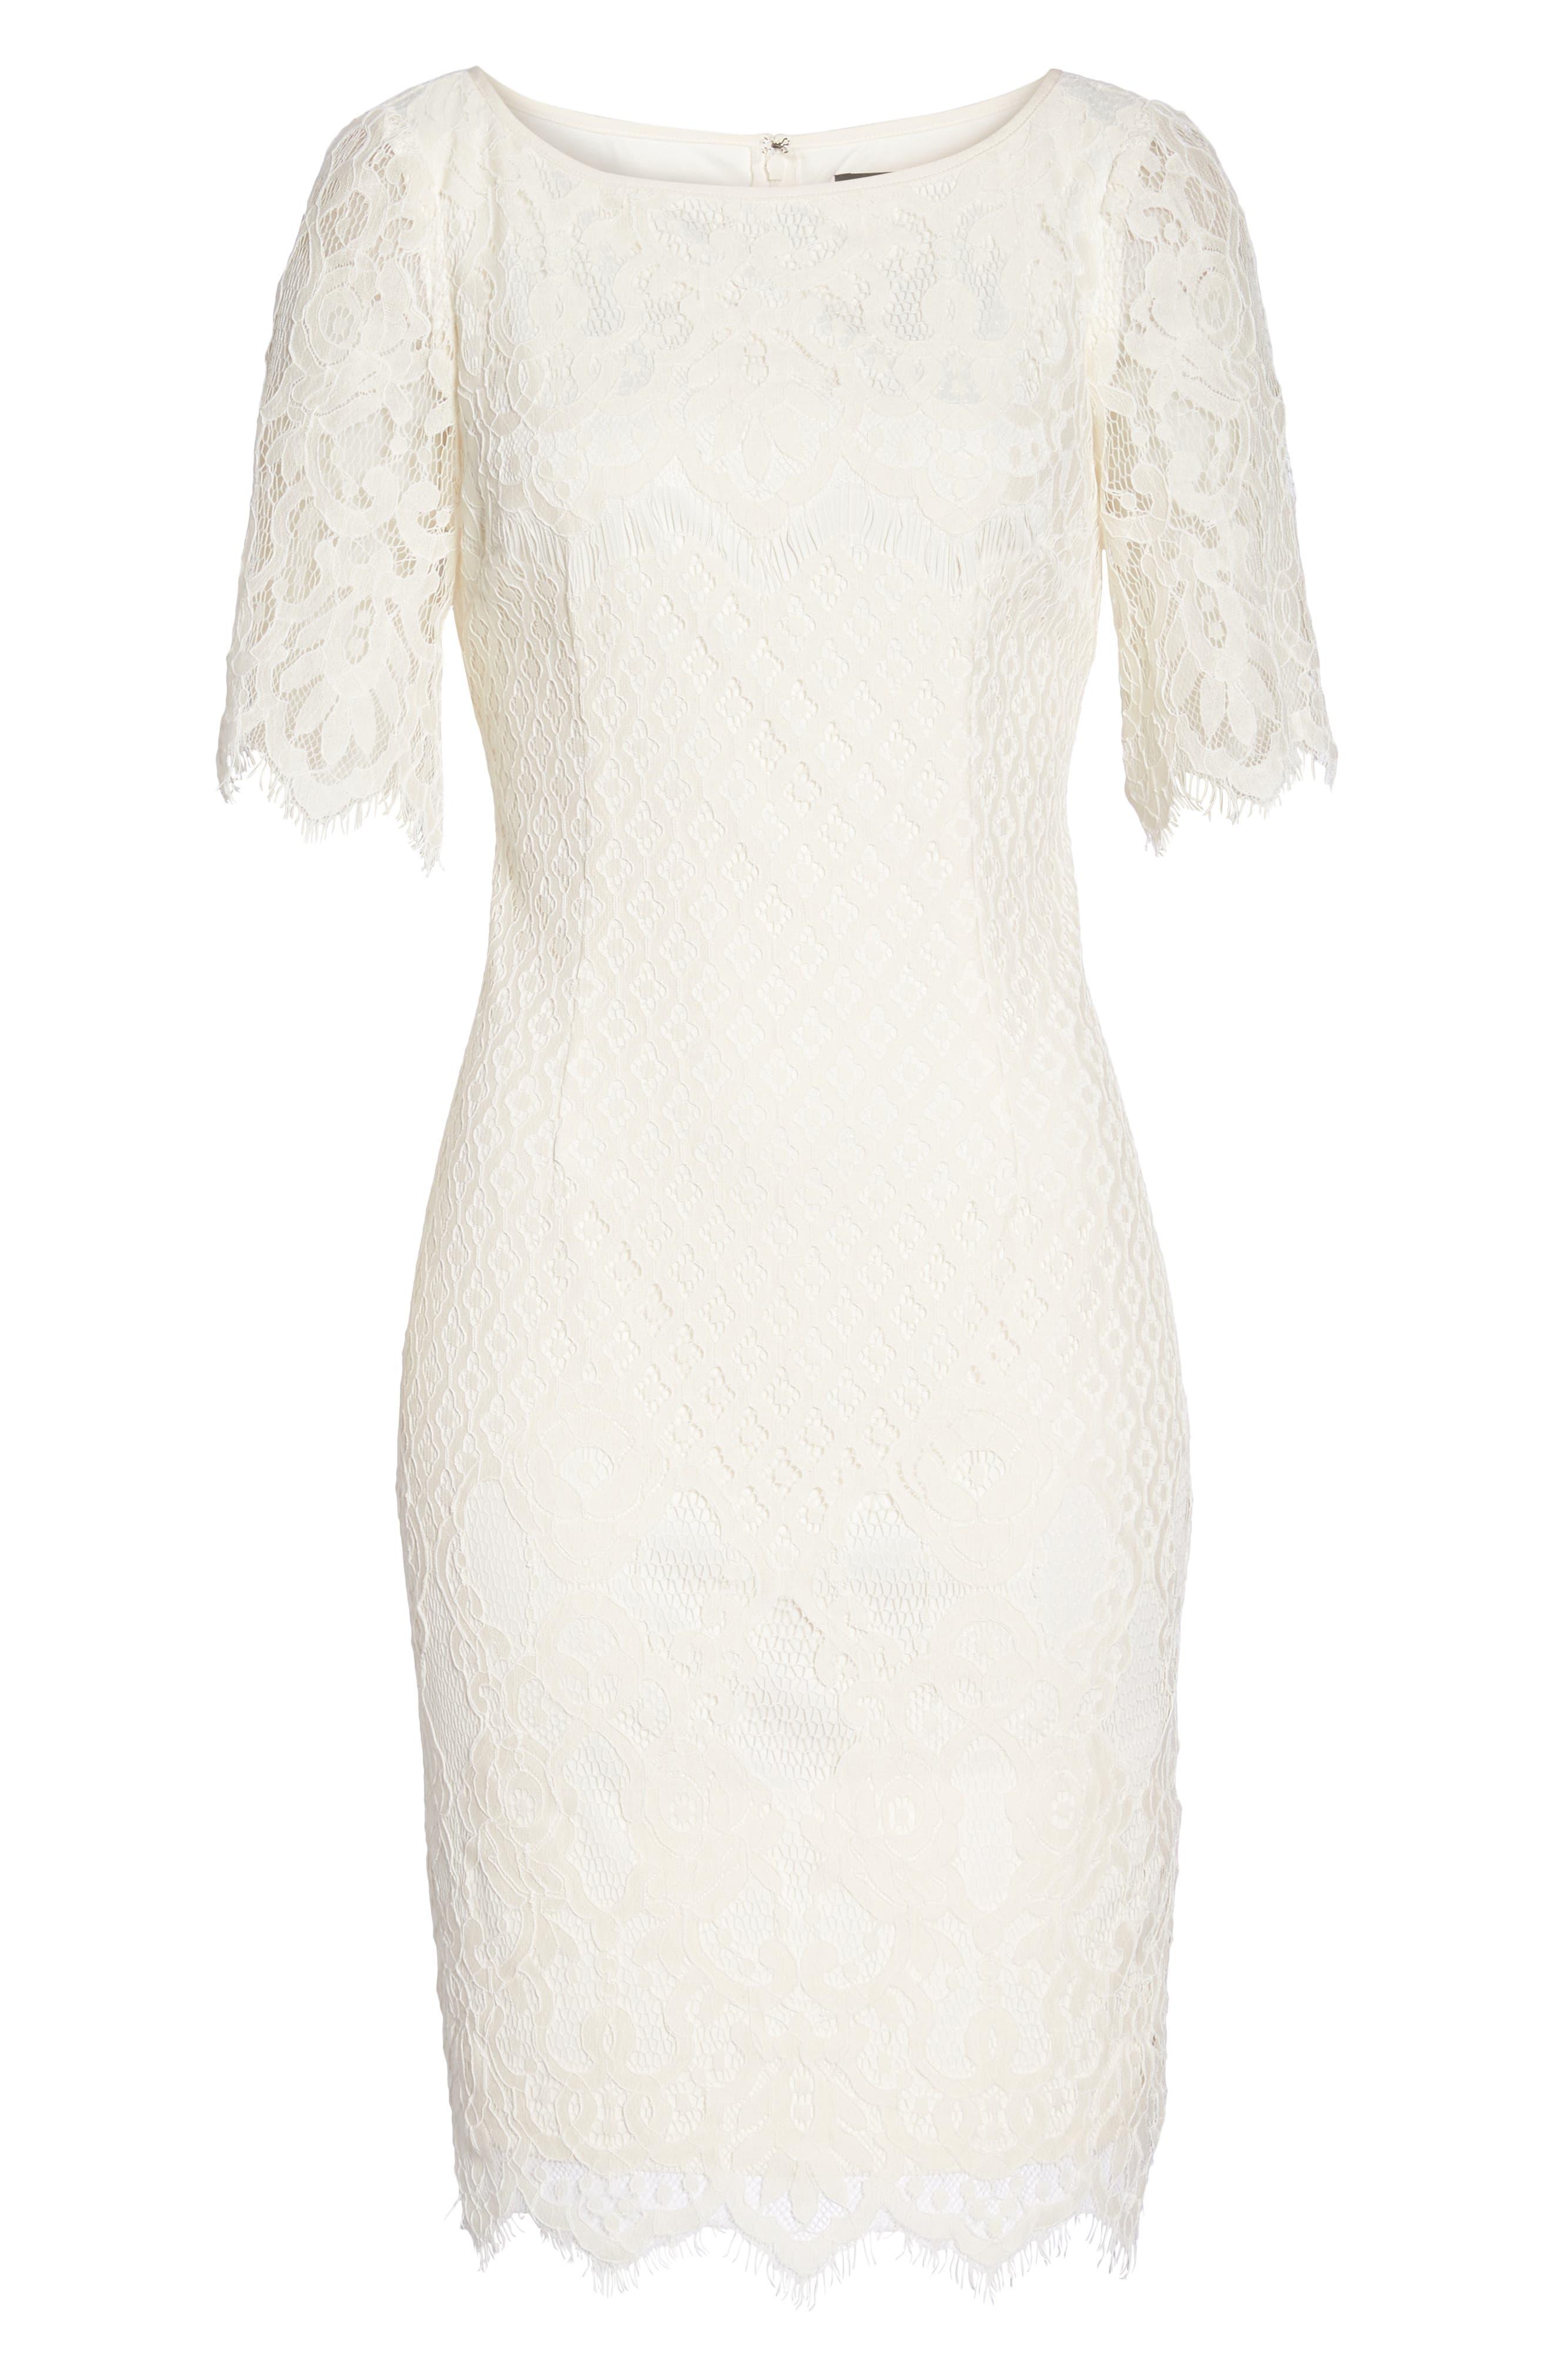 Georgia Scalloped Lace Sheath Dress,                             Alternate thumbnail 7, color,                             Ivory